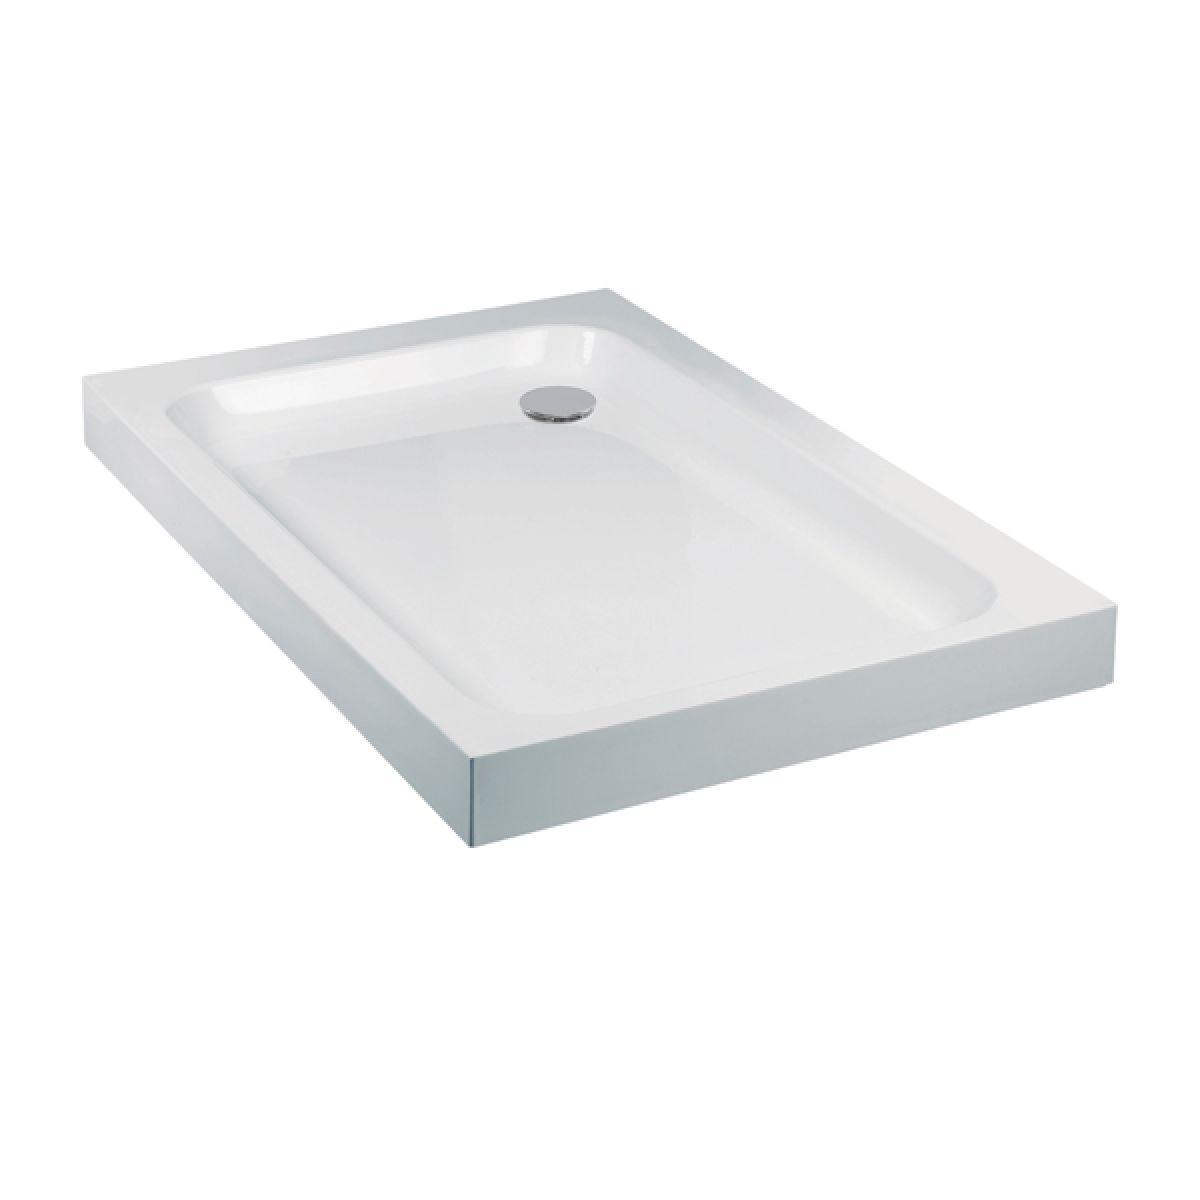 Frontline Standard Rectanglular Shower Tray 1000 x 760mm